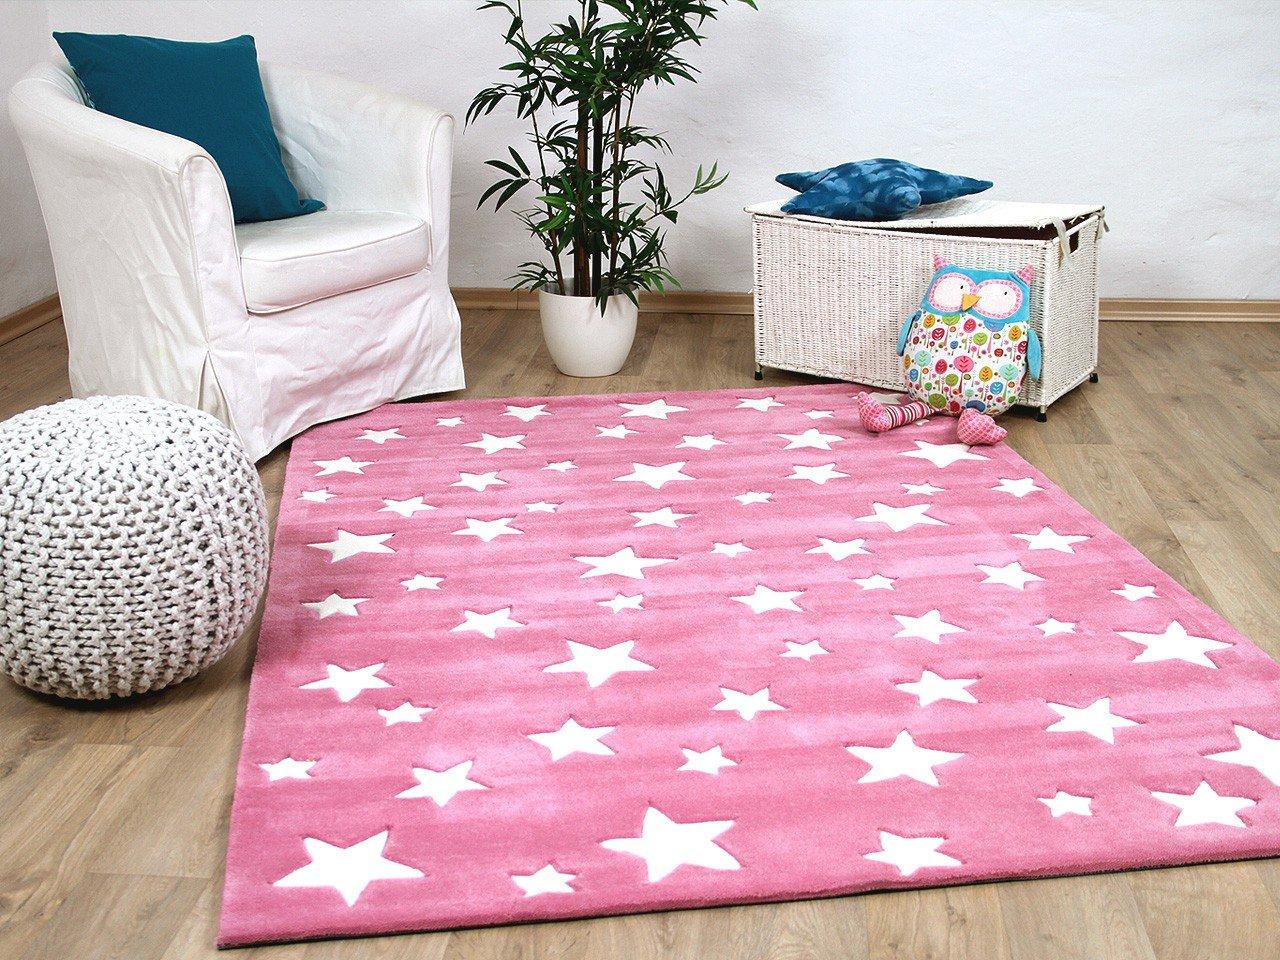 Lifestyle Kinderteppich Sterne Rosa Pink     Sofort Lieferbar